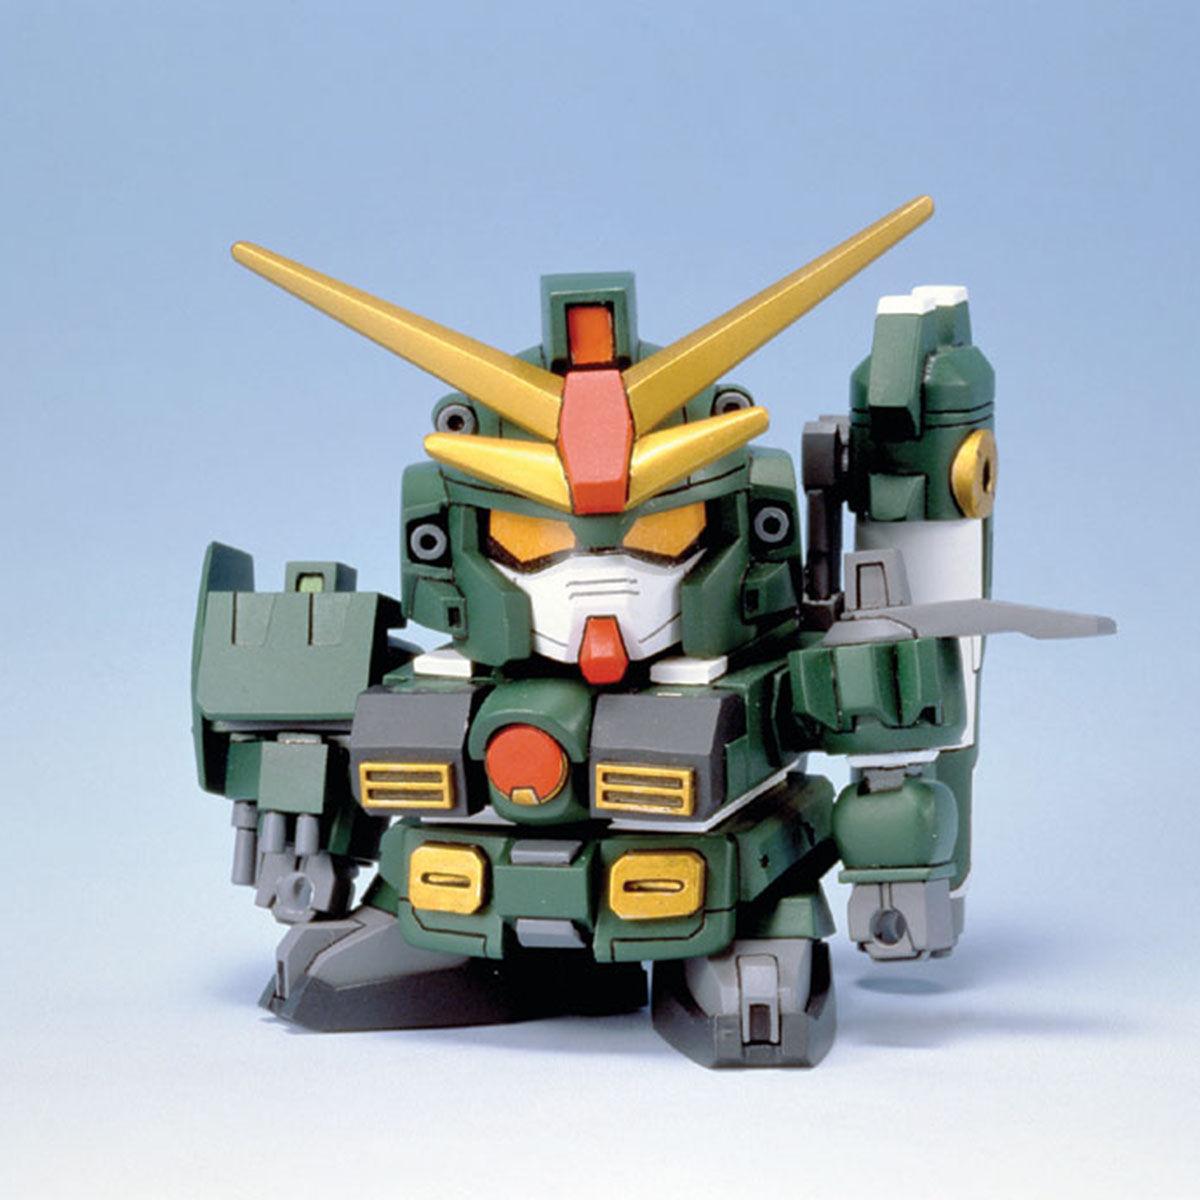 SDガンダム GジェネレーションF(GGENERATION-F) 045 GT-9600 ガンダムレオパルド [Gundam Leopard] 0077075 5060805 4573102608055 4902425770758